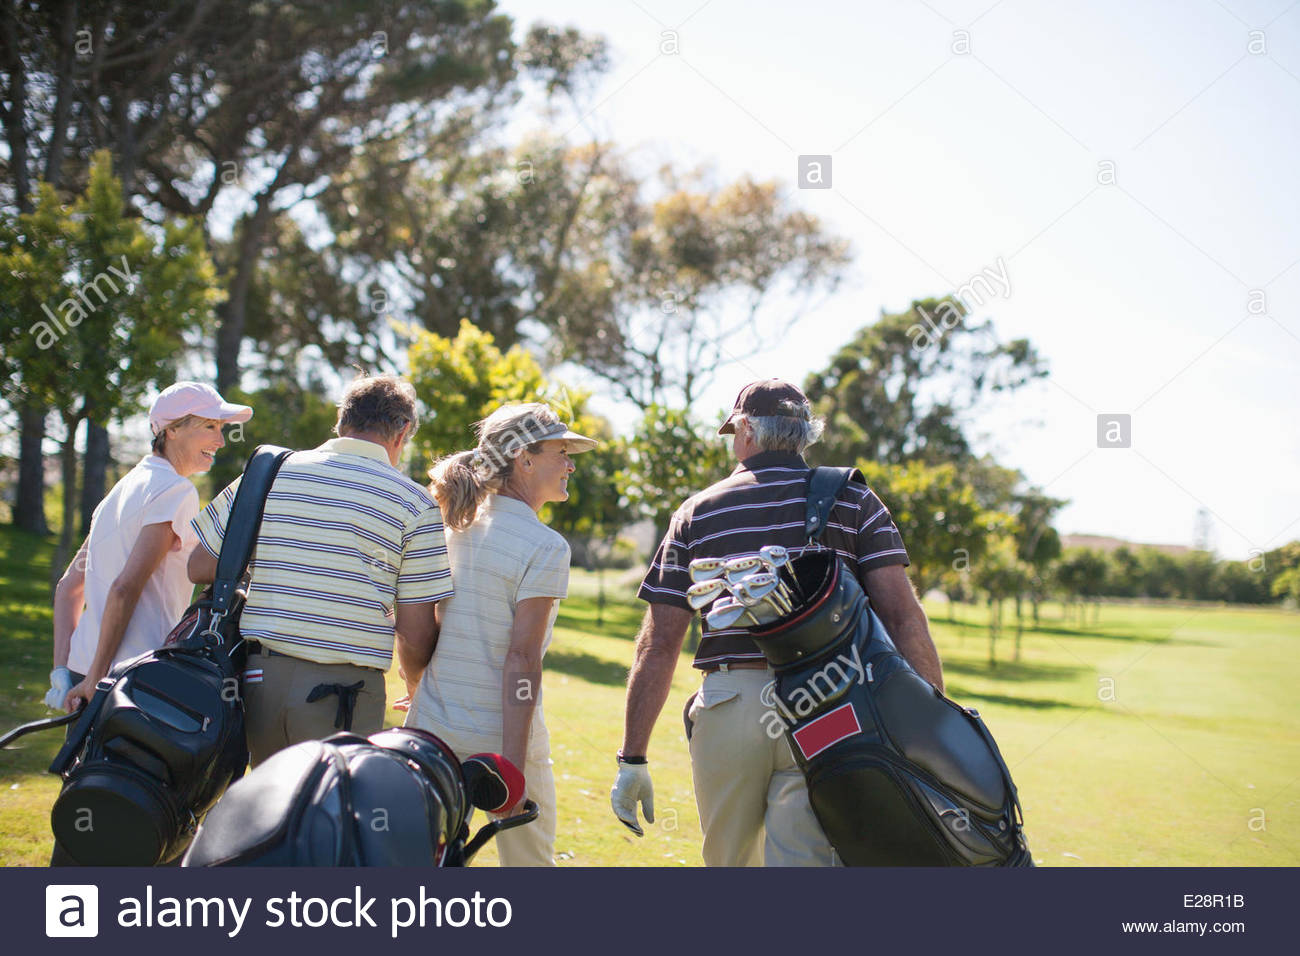 Pareja llevar bolsas de golf Imagen De Stock